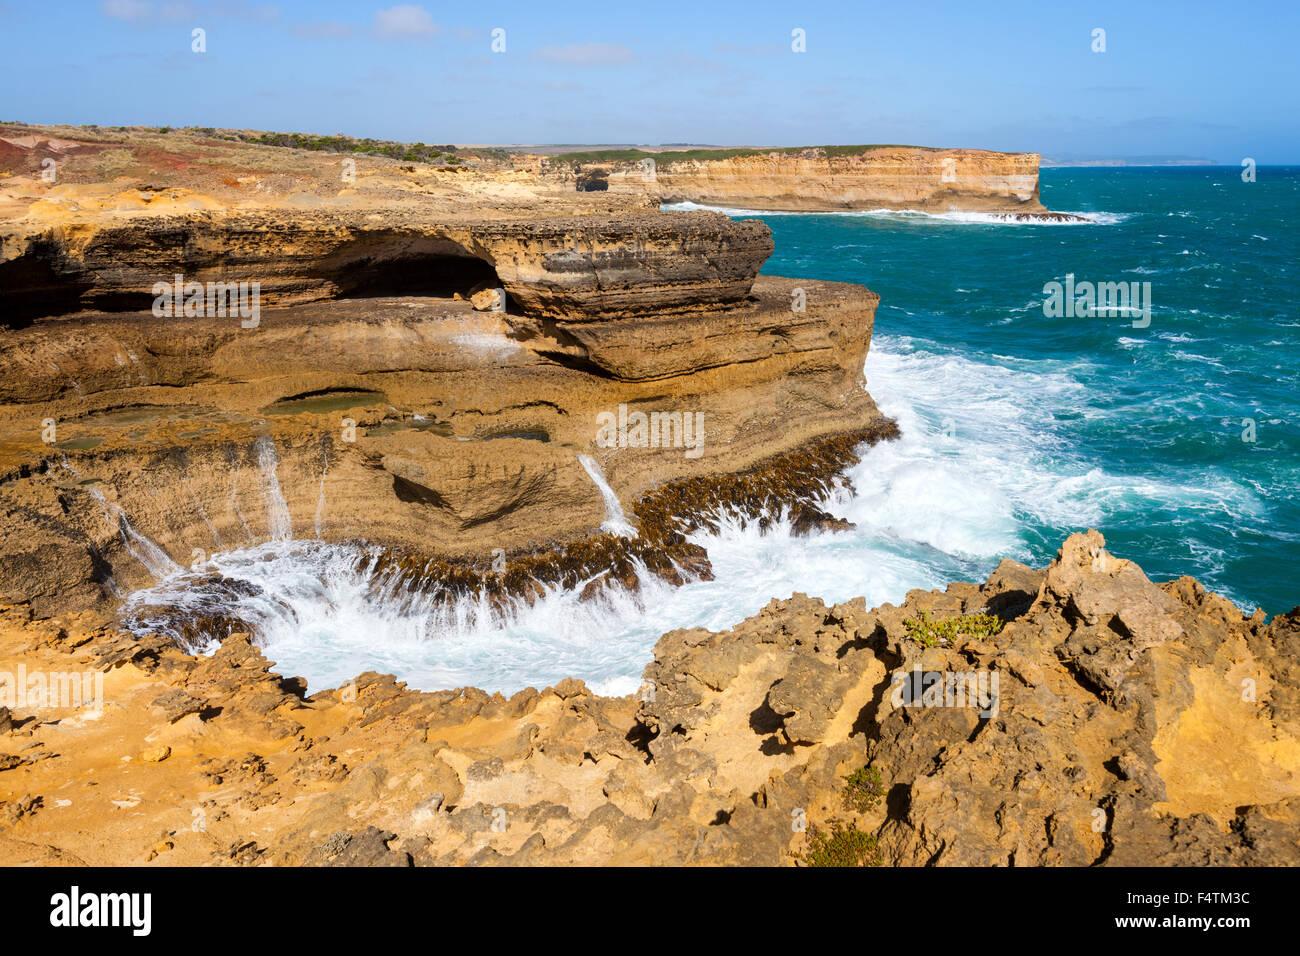 Broken Head, l'Australie, Victoria, port Campbell, parc national, mer, côte, rock, falaise, Photo Stock